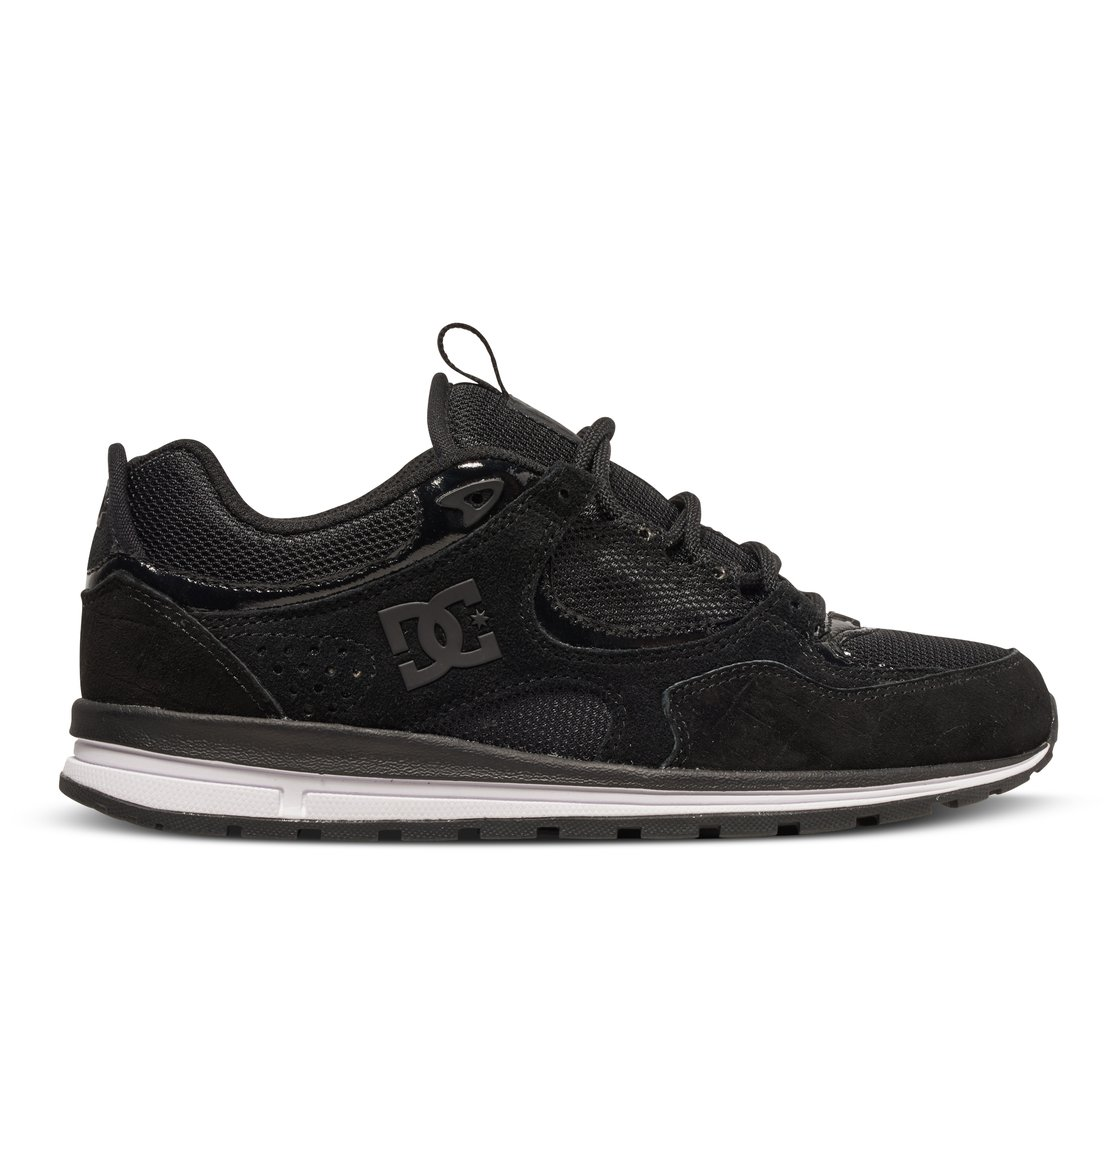 Zapatos negros DC Shoes para mujer a54bk5